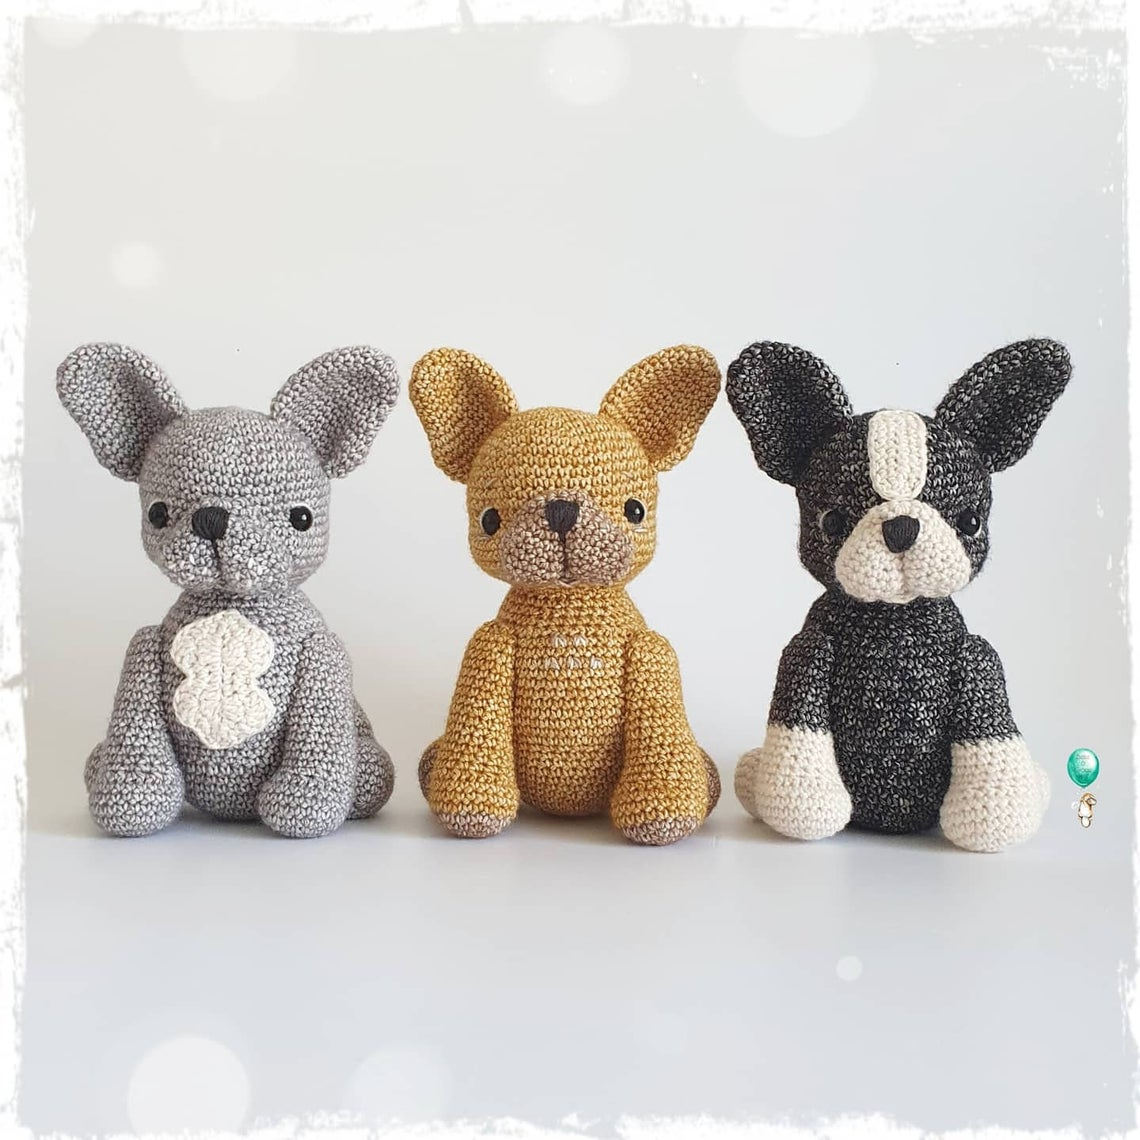 Crochet A French Bulldog Amigurumi ... Who's A Cute Frenchie?